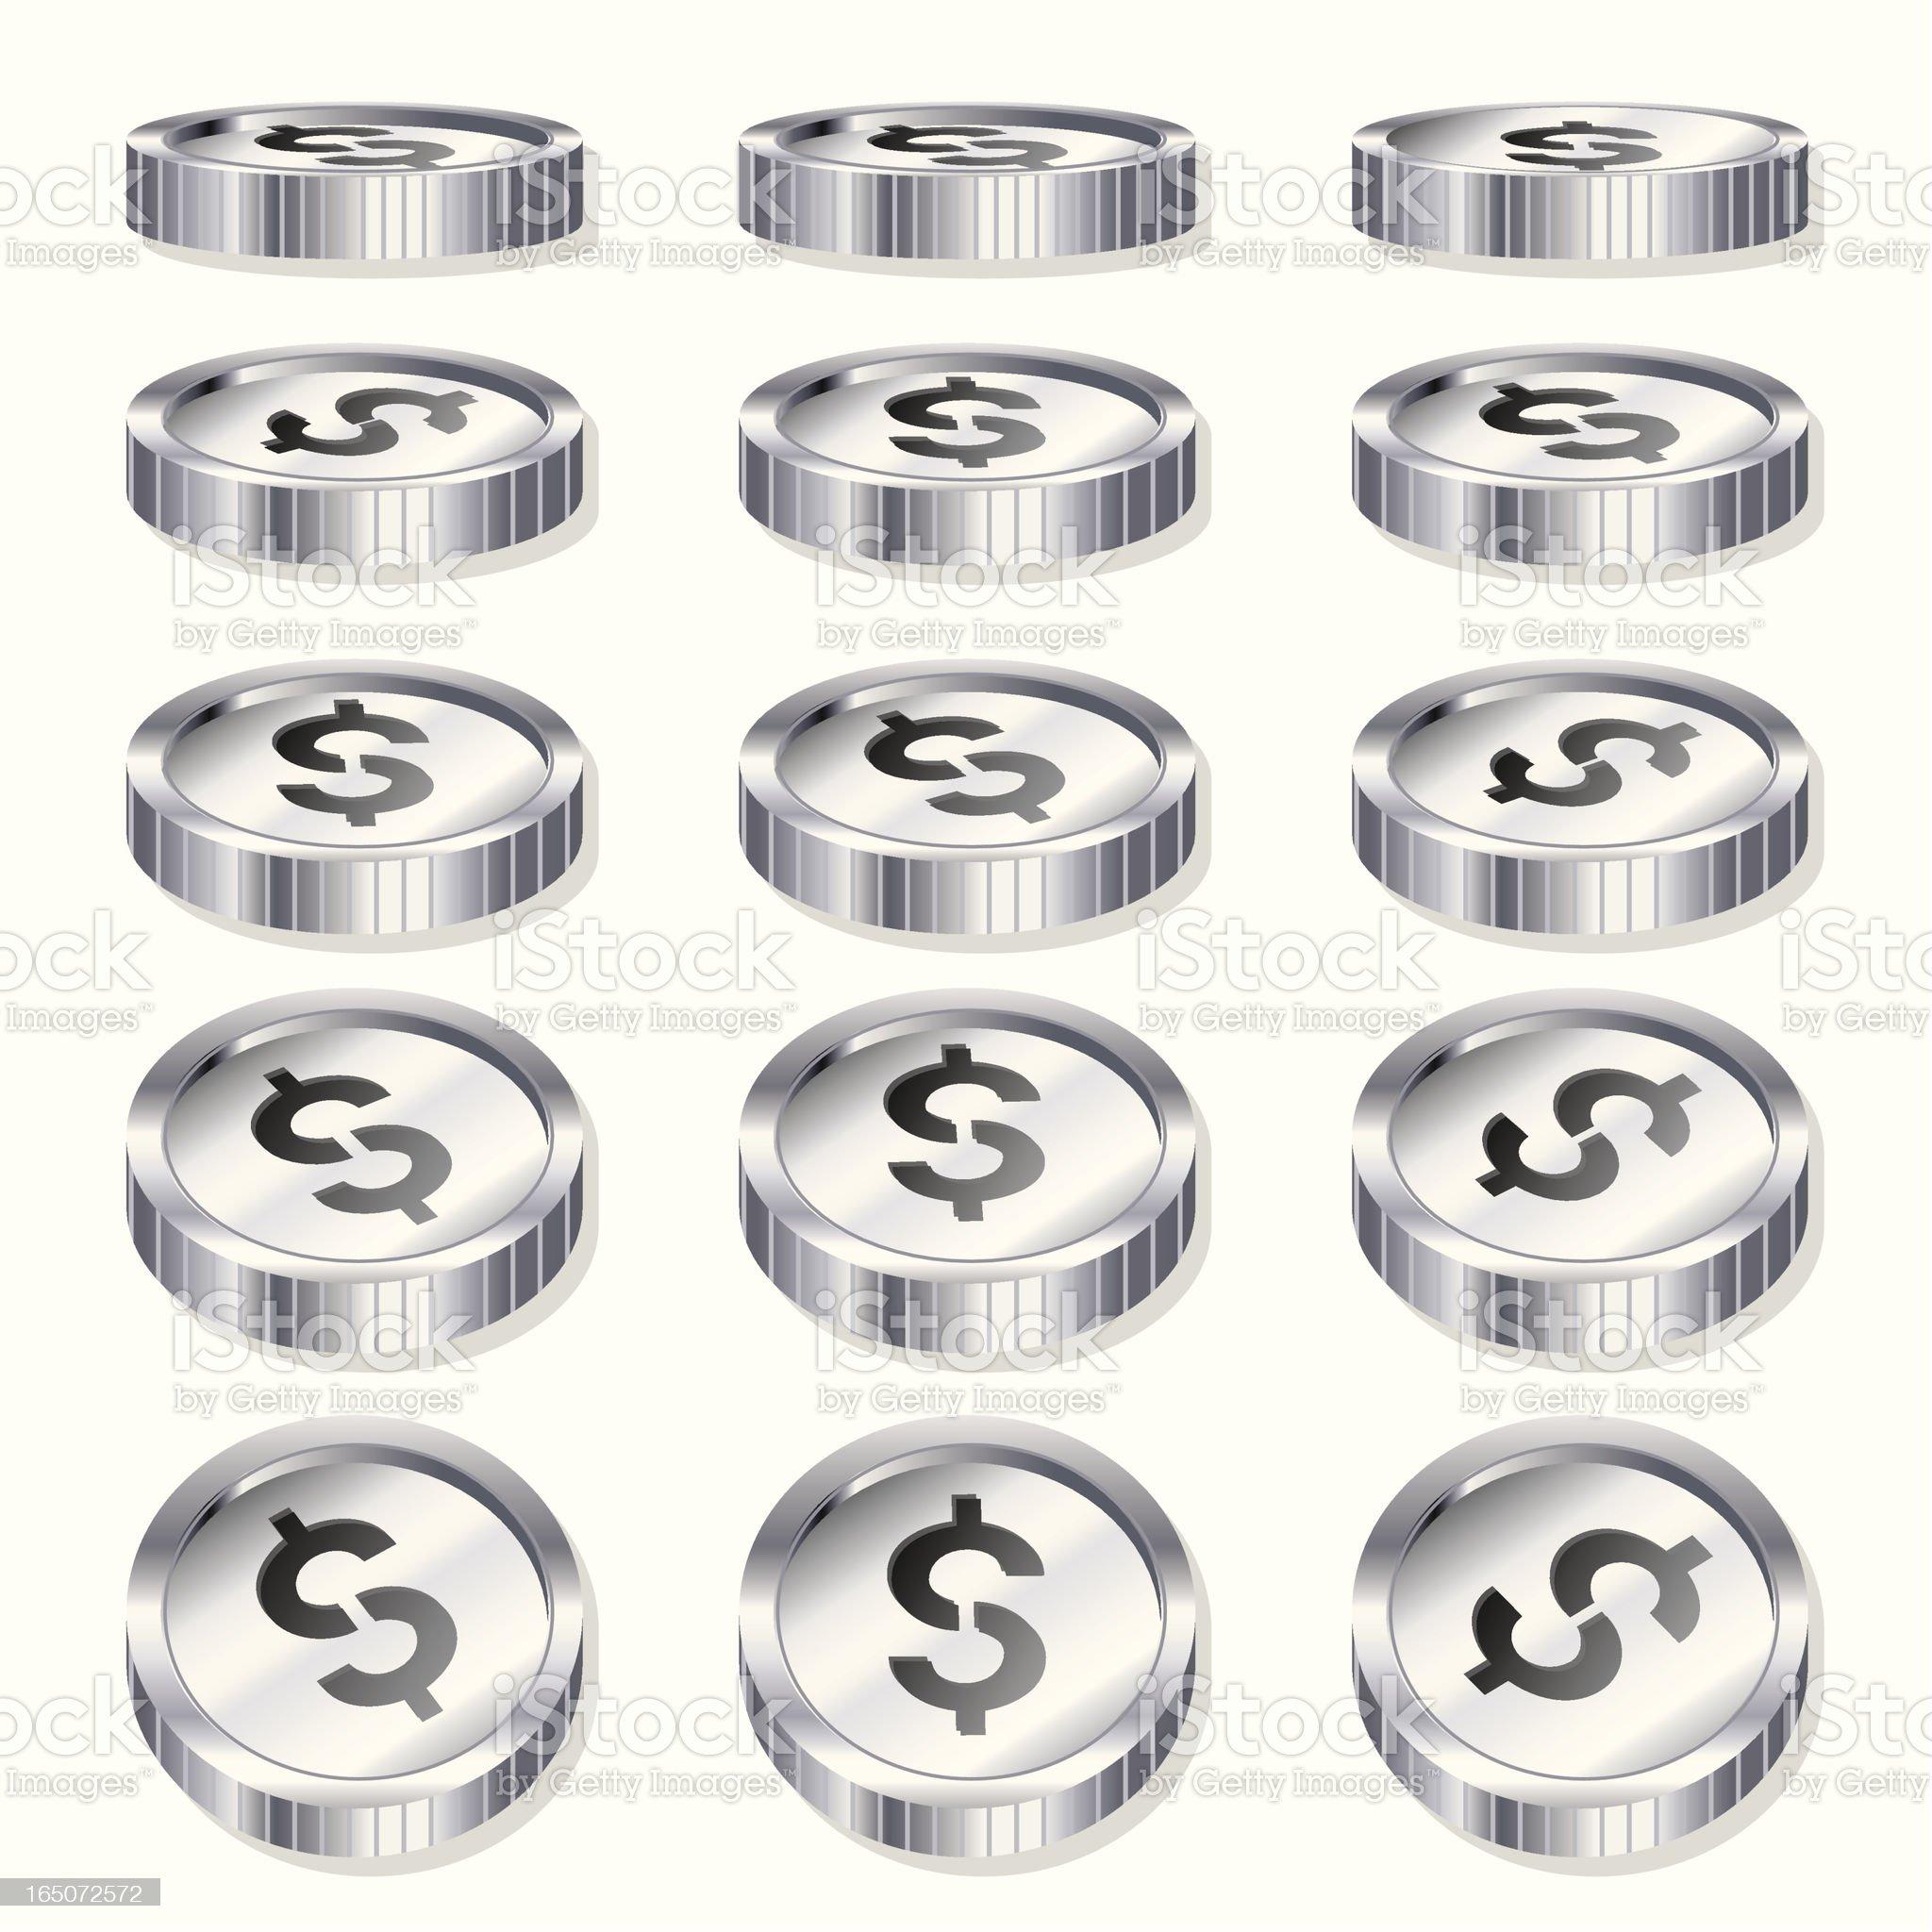 Chrome Coins -Tokens royalty-free stock vector art